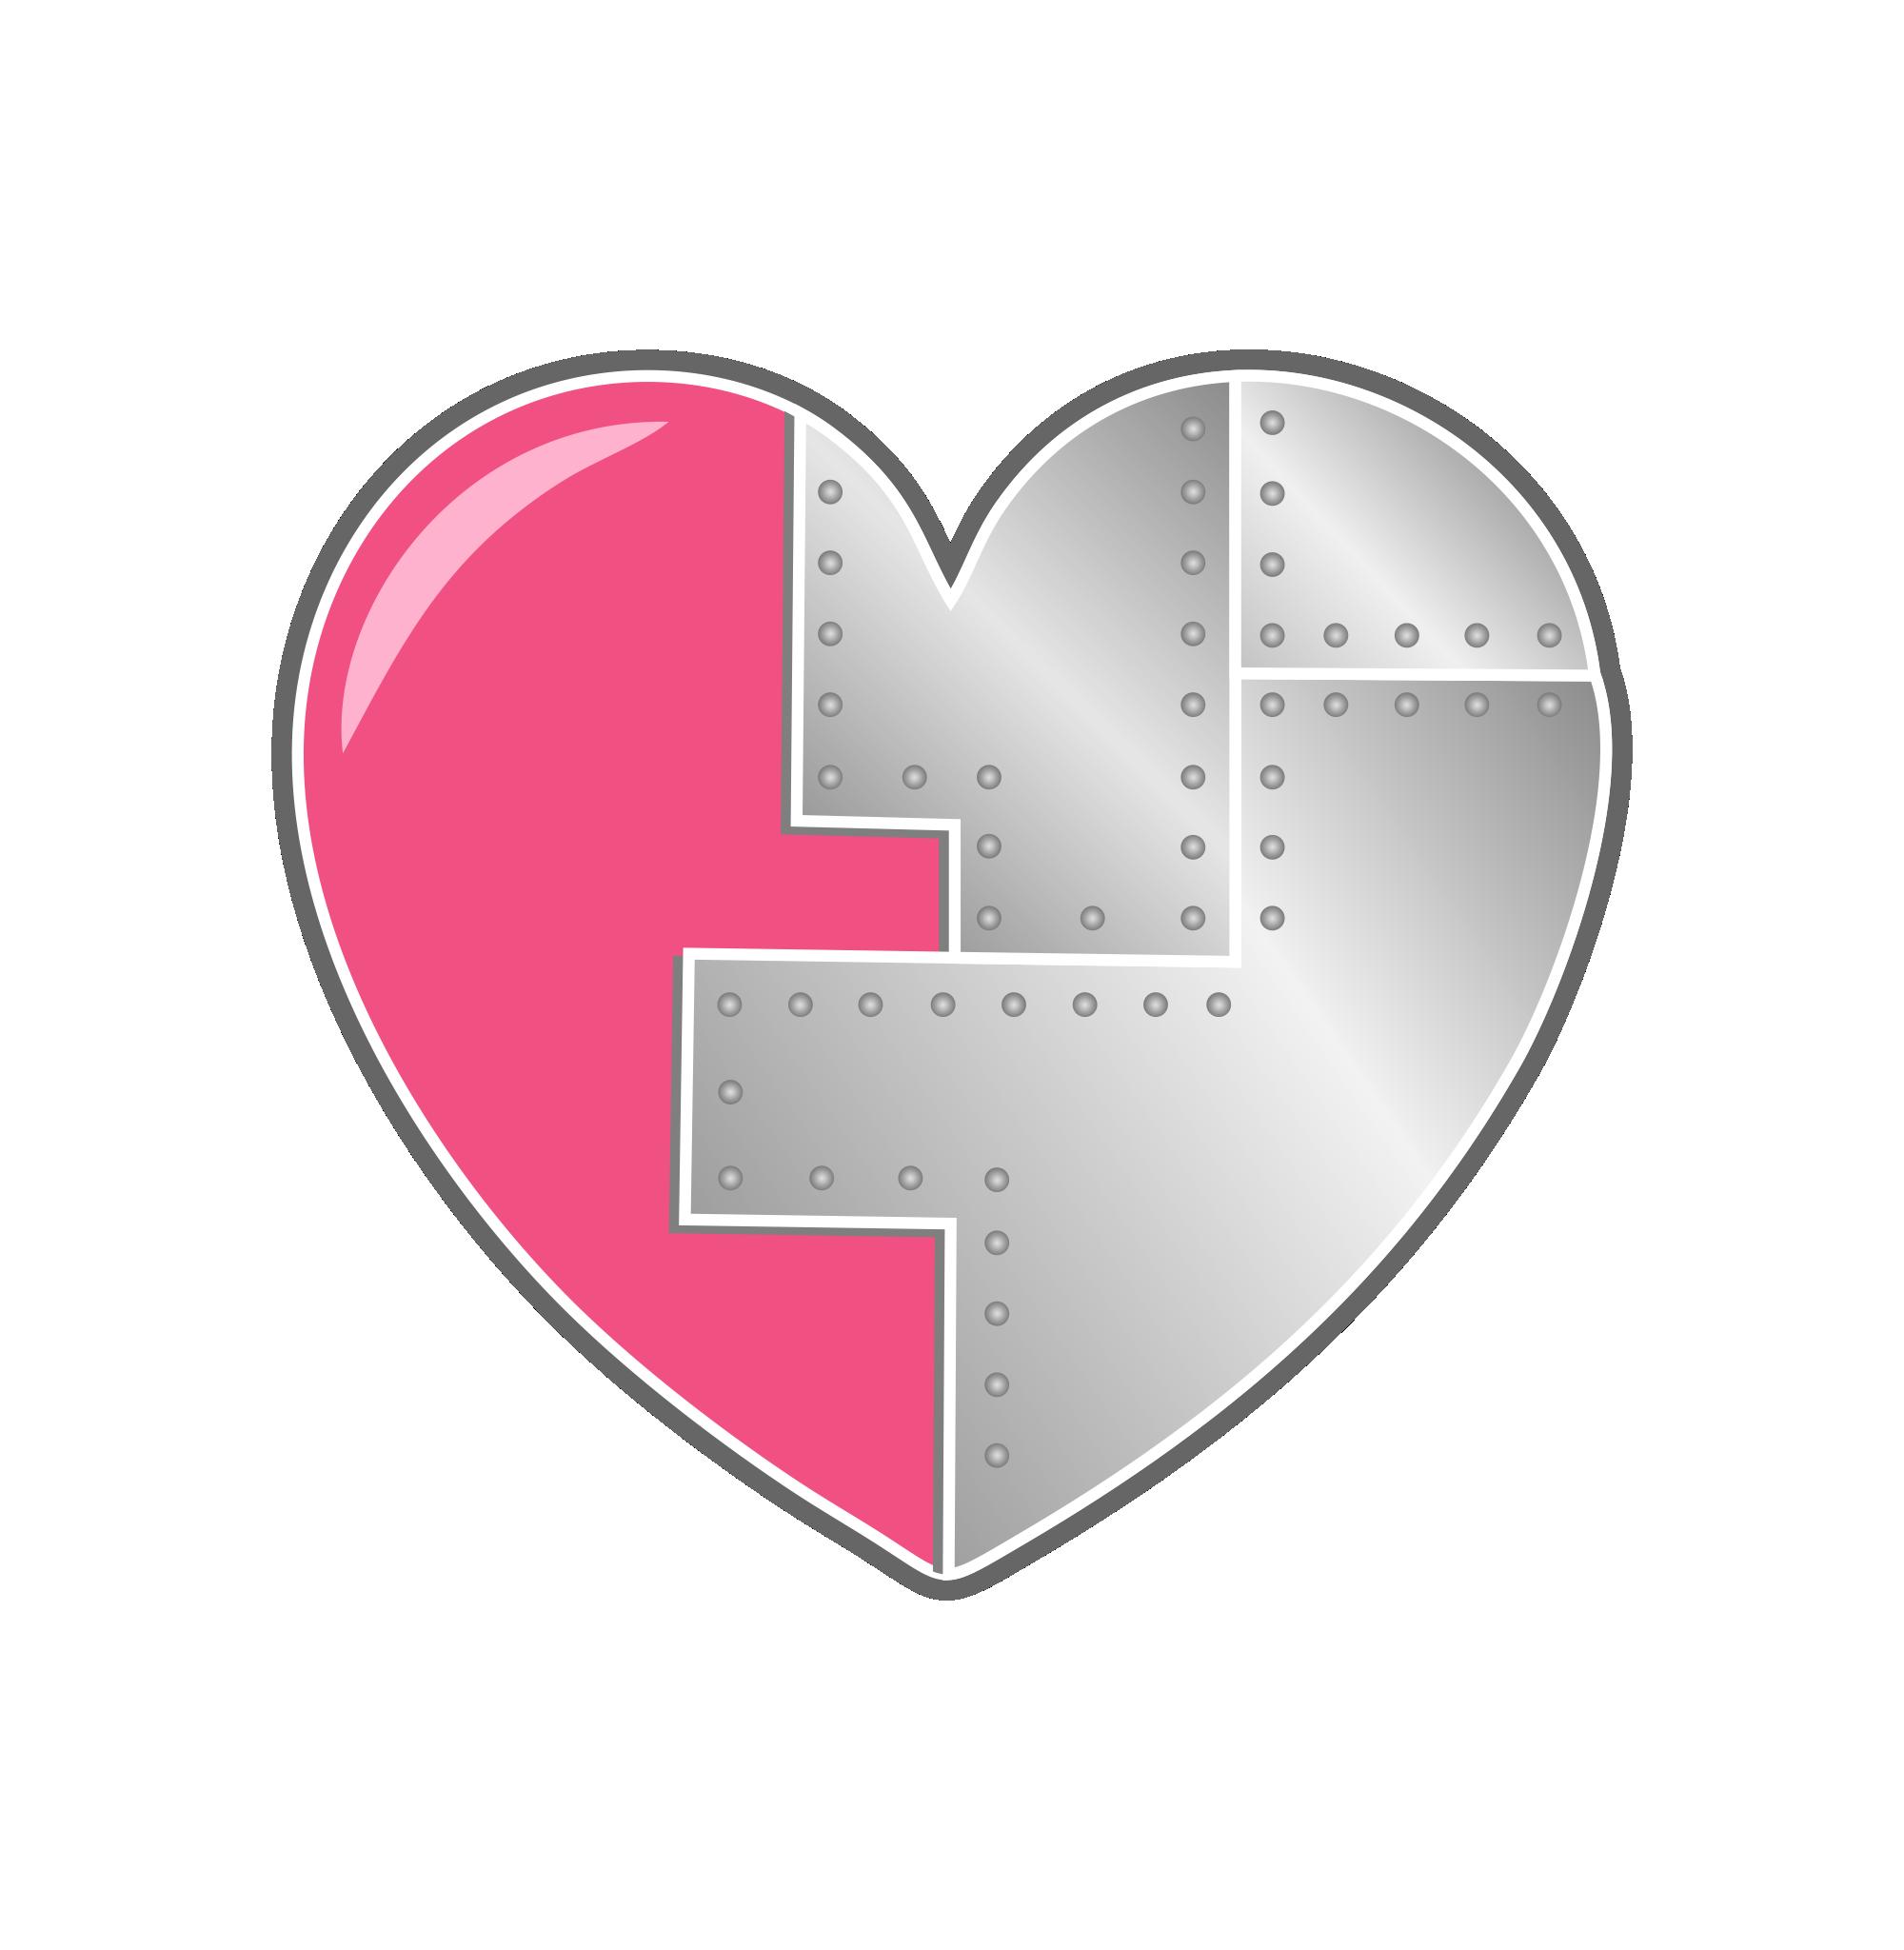 Please help me launch my new business - I Heart Metal Art!